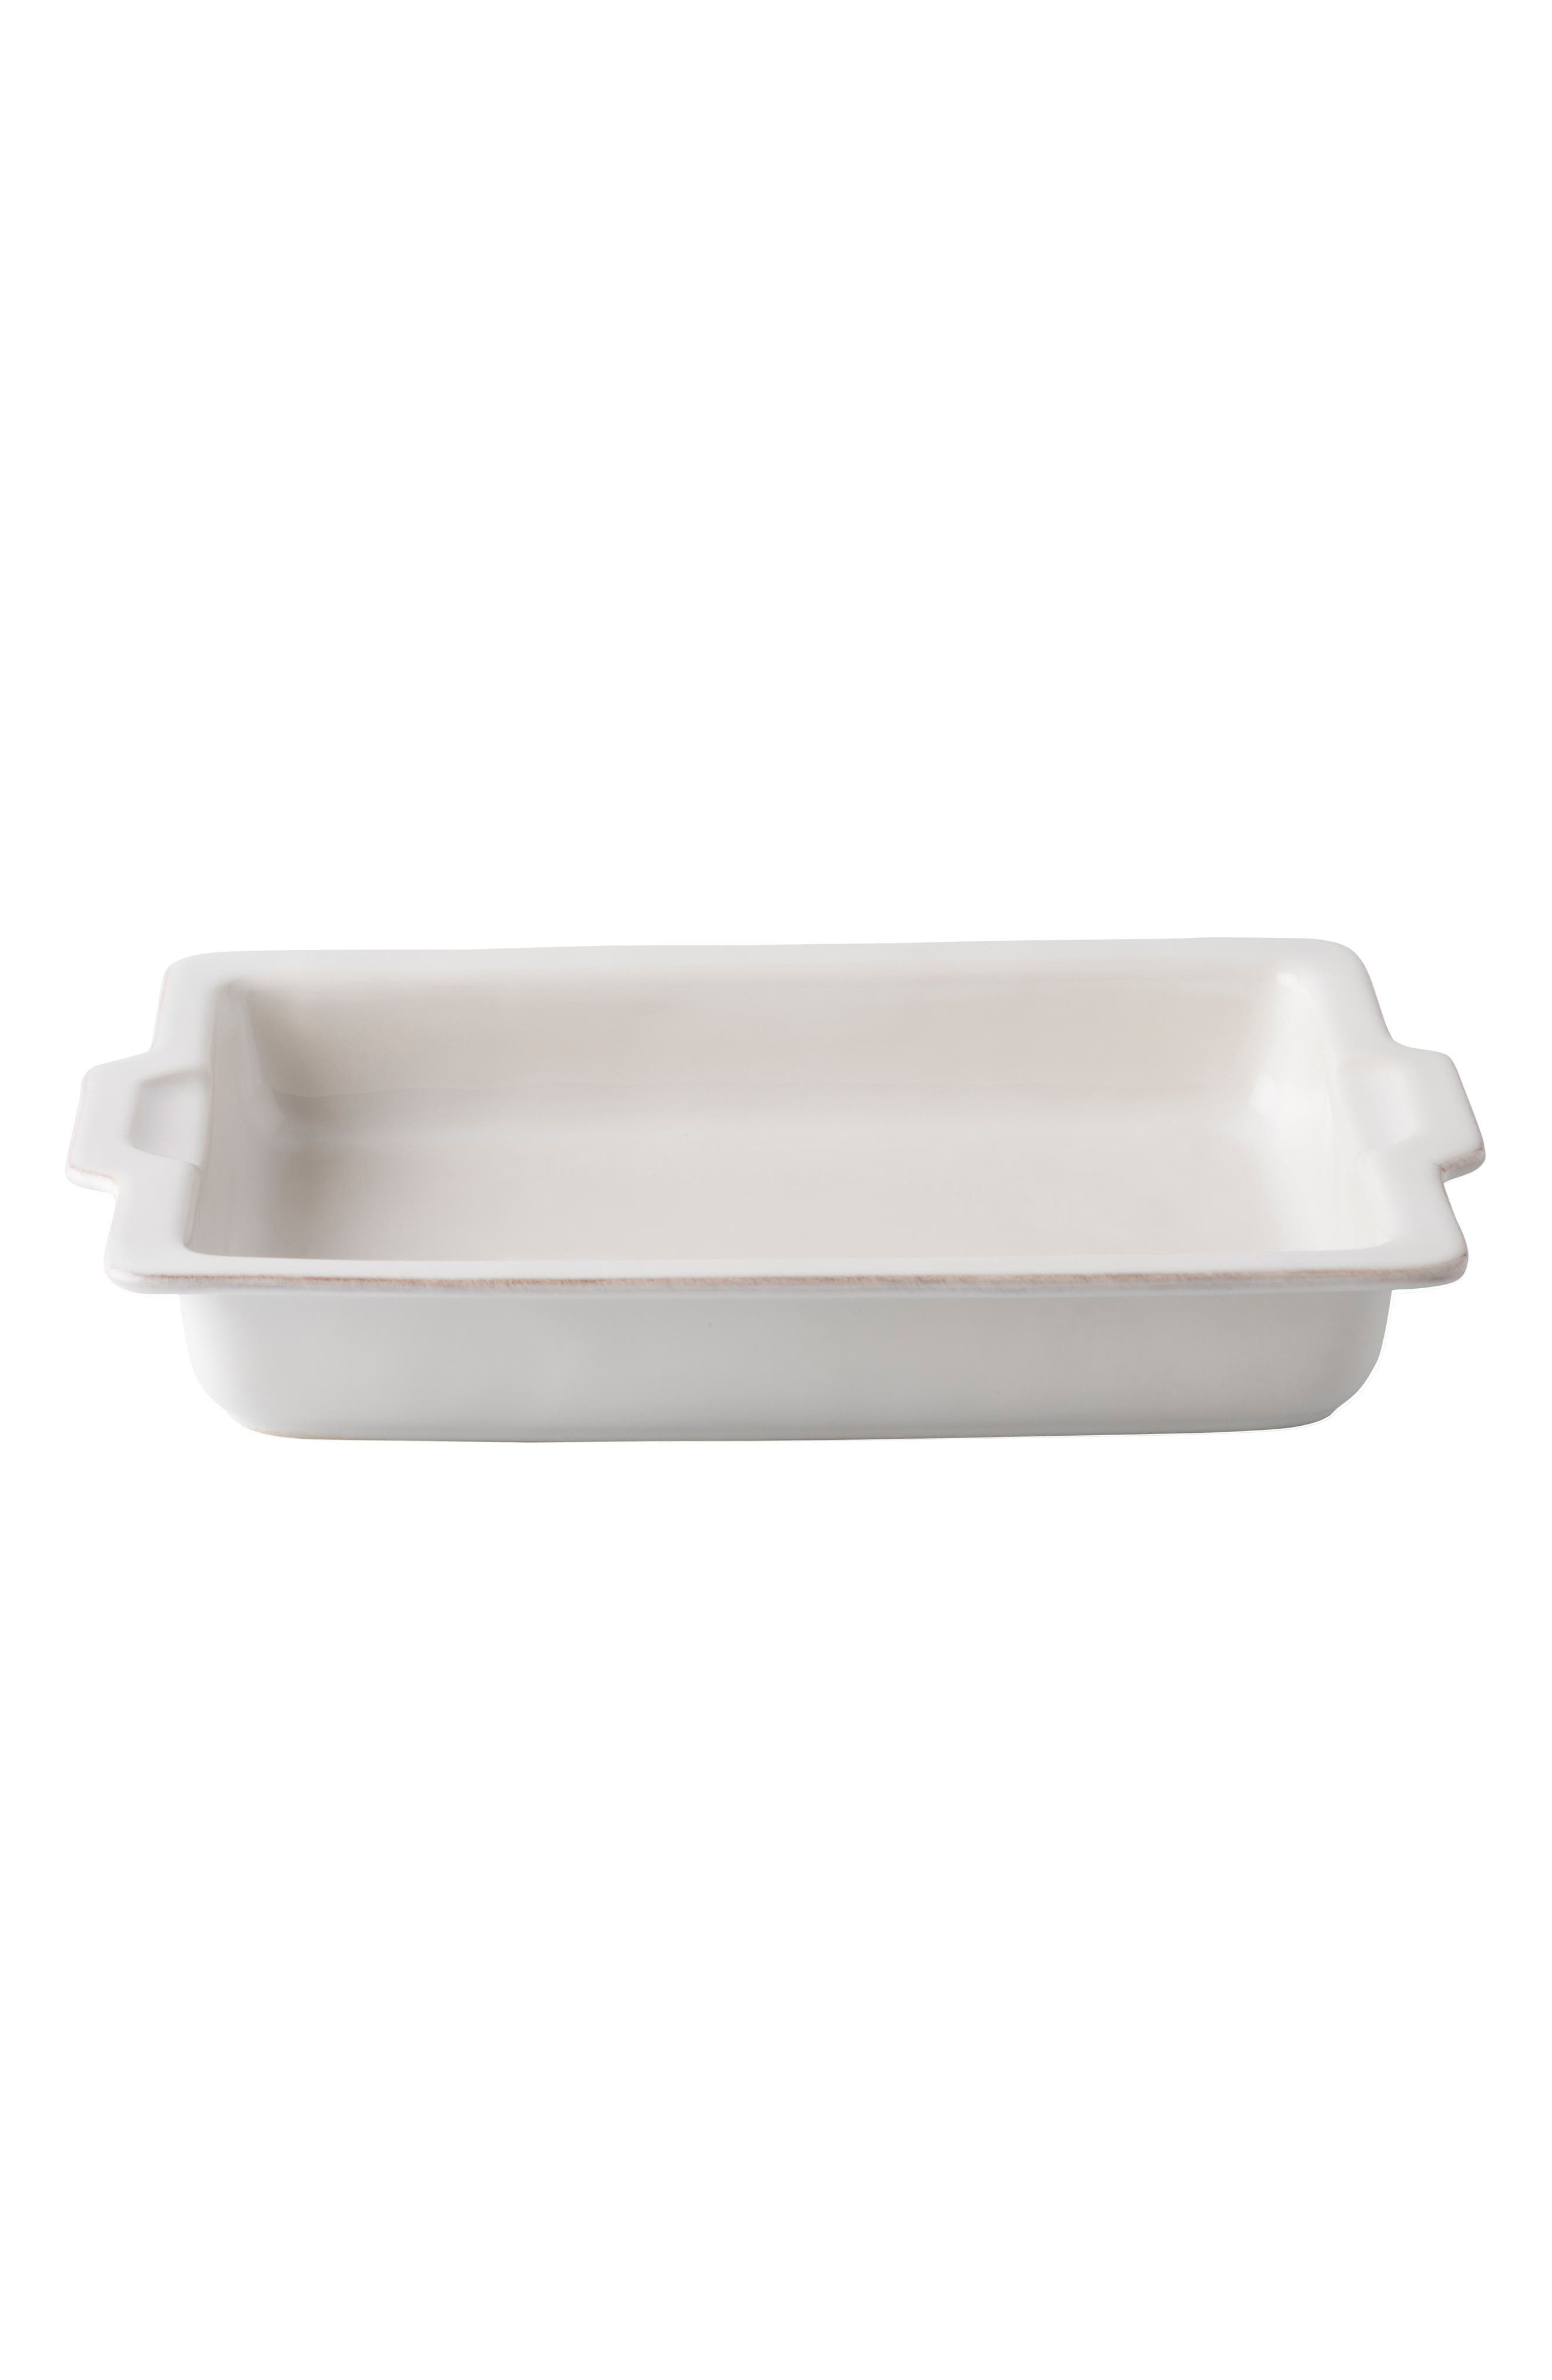 Puro Large Ceramic Baking Dish,                         Main,                         color, Whitewash